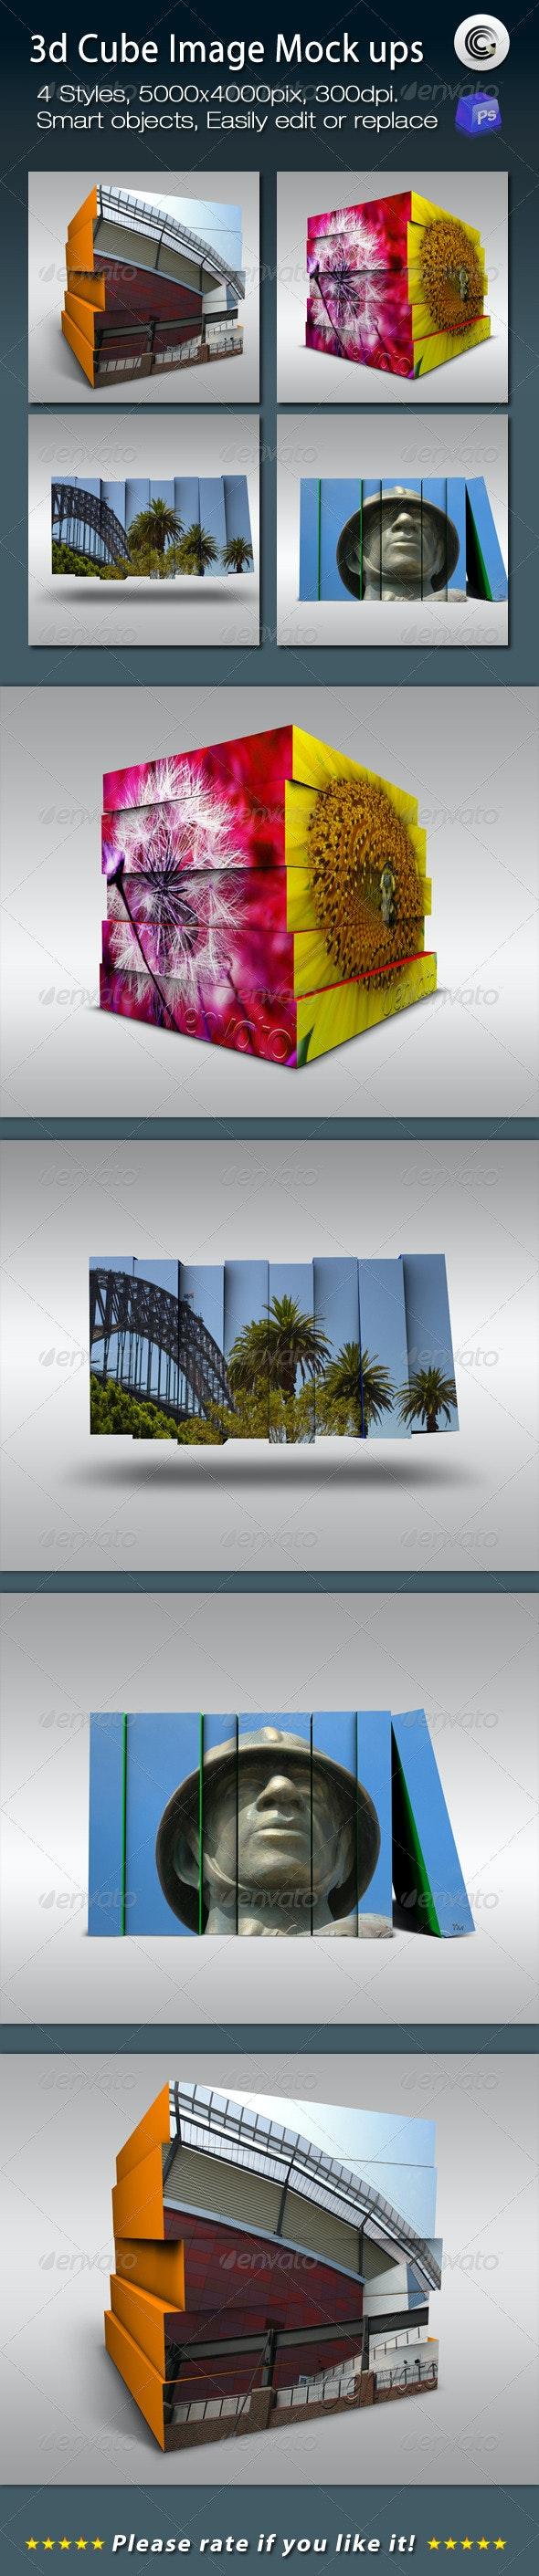 3D Cube Image Mock ups - Tech / Futuristic Photo Templates